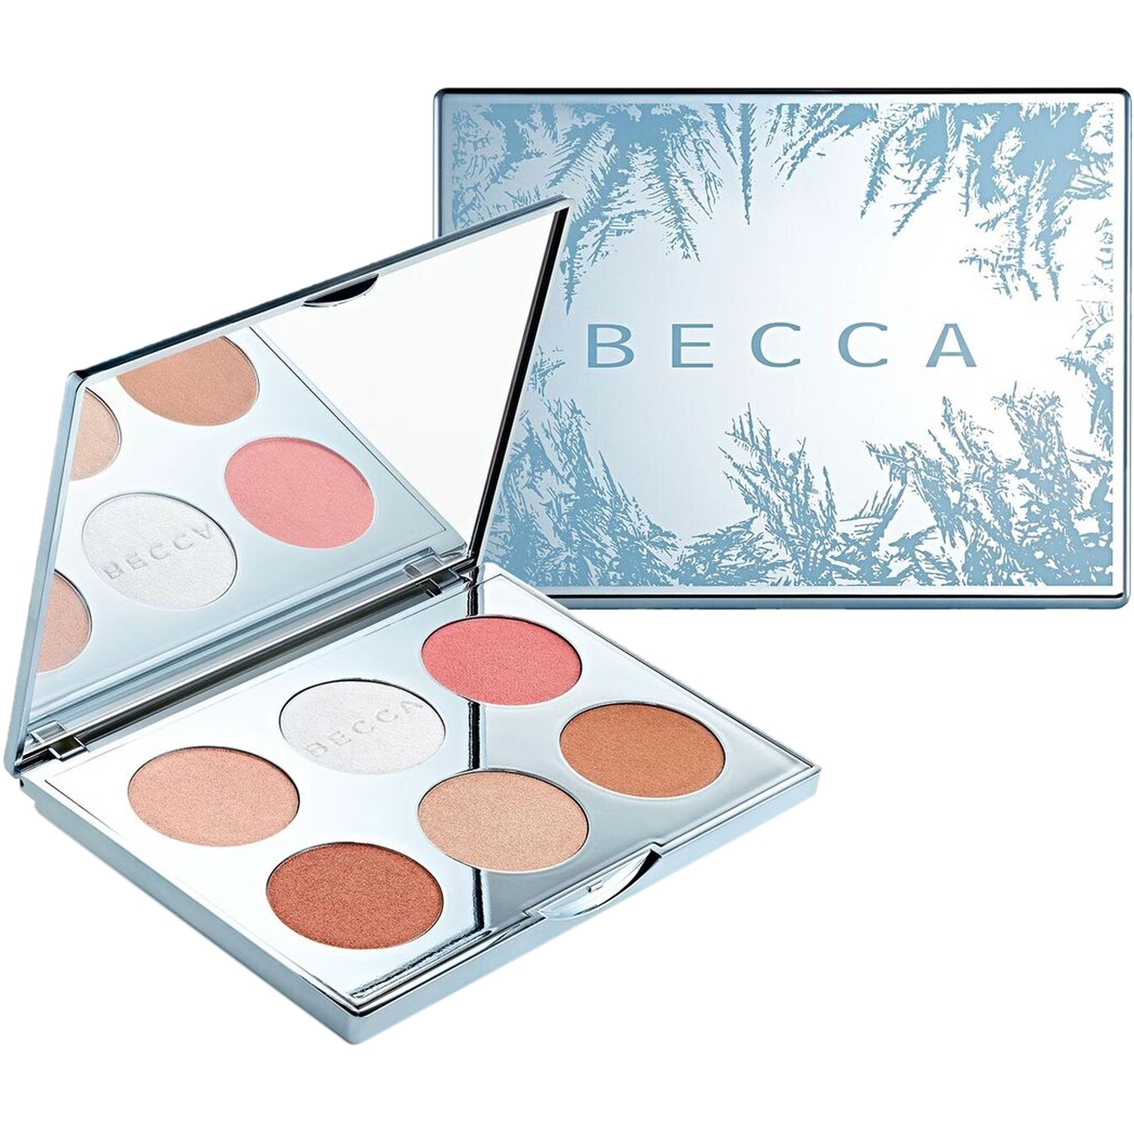 Becca Apres Ski Glow Face Palette | Blush | Beauty & Health | Shop ...